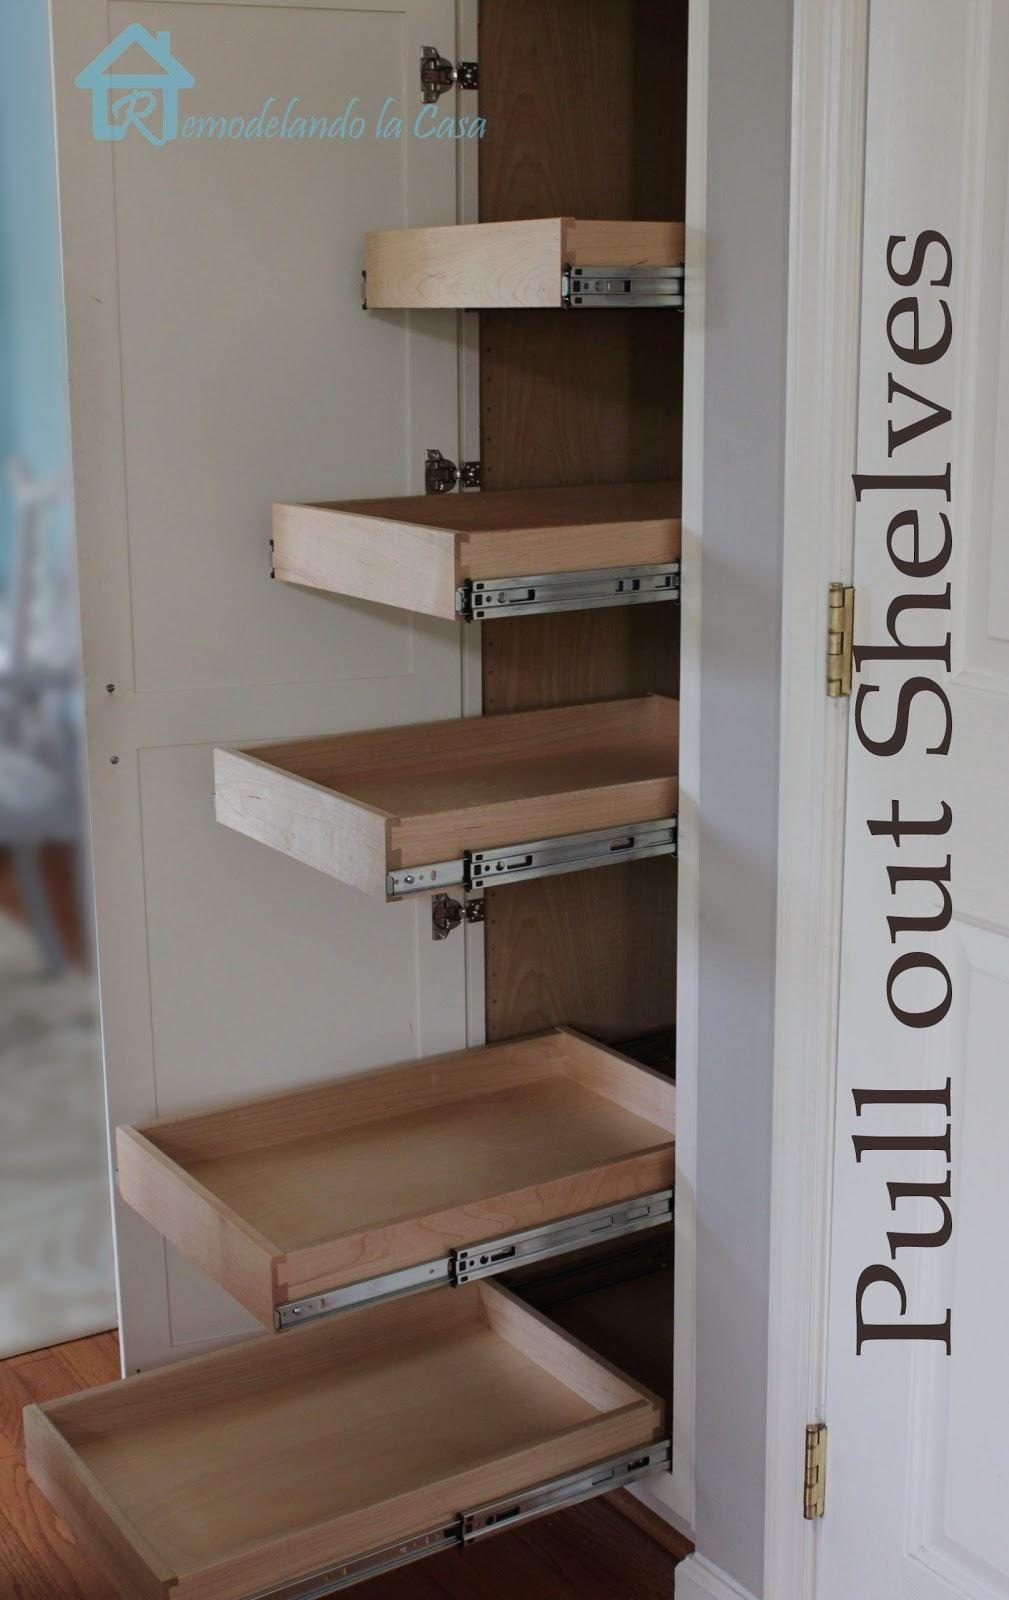 Cheap Home Improvement Ideas Shelves Home Decor Kitchen